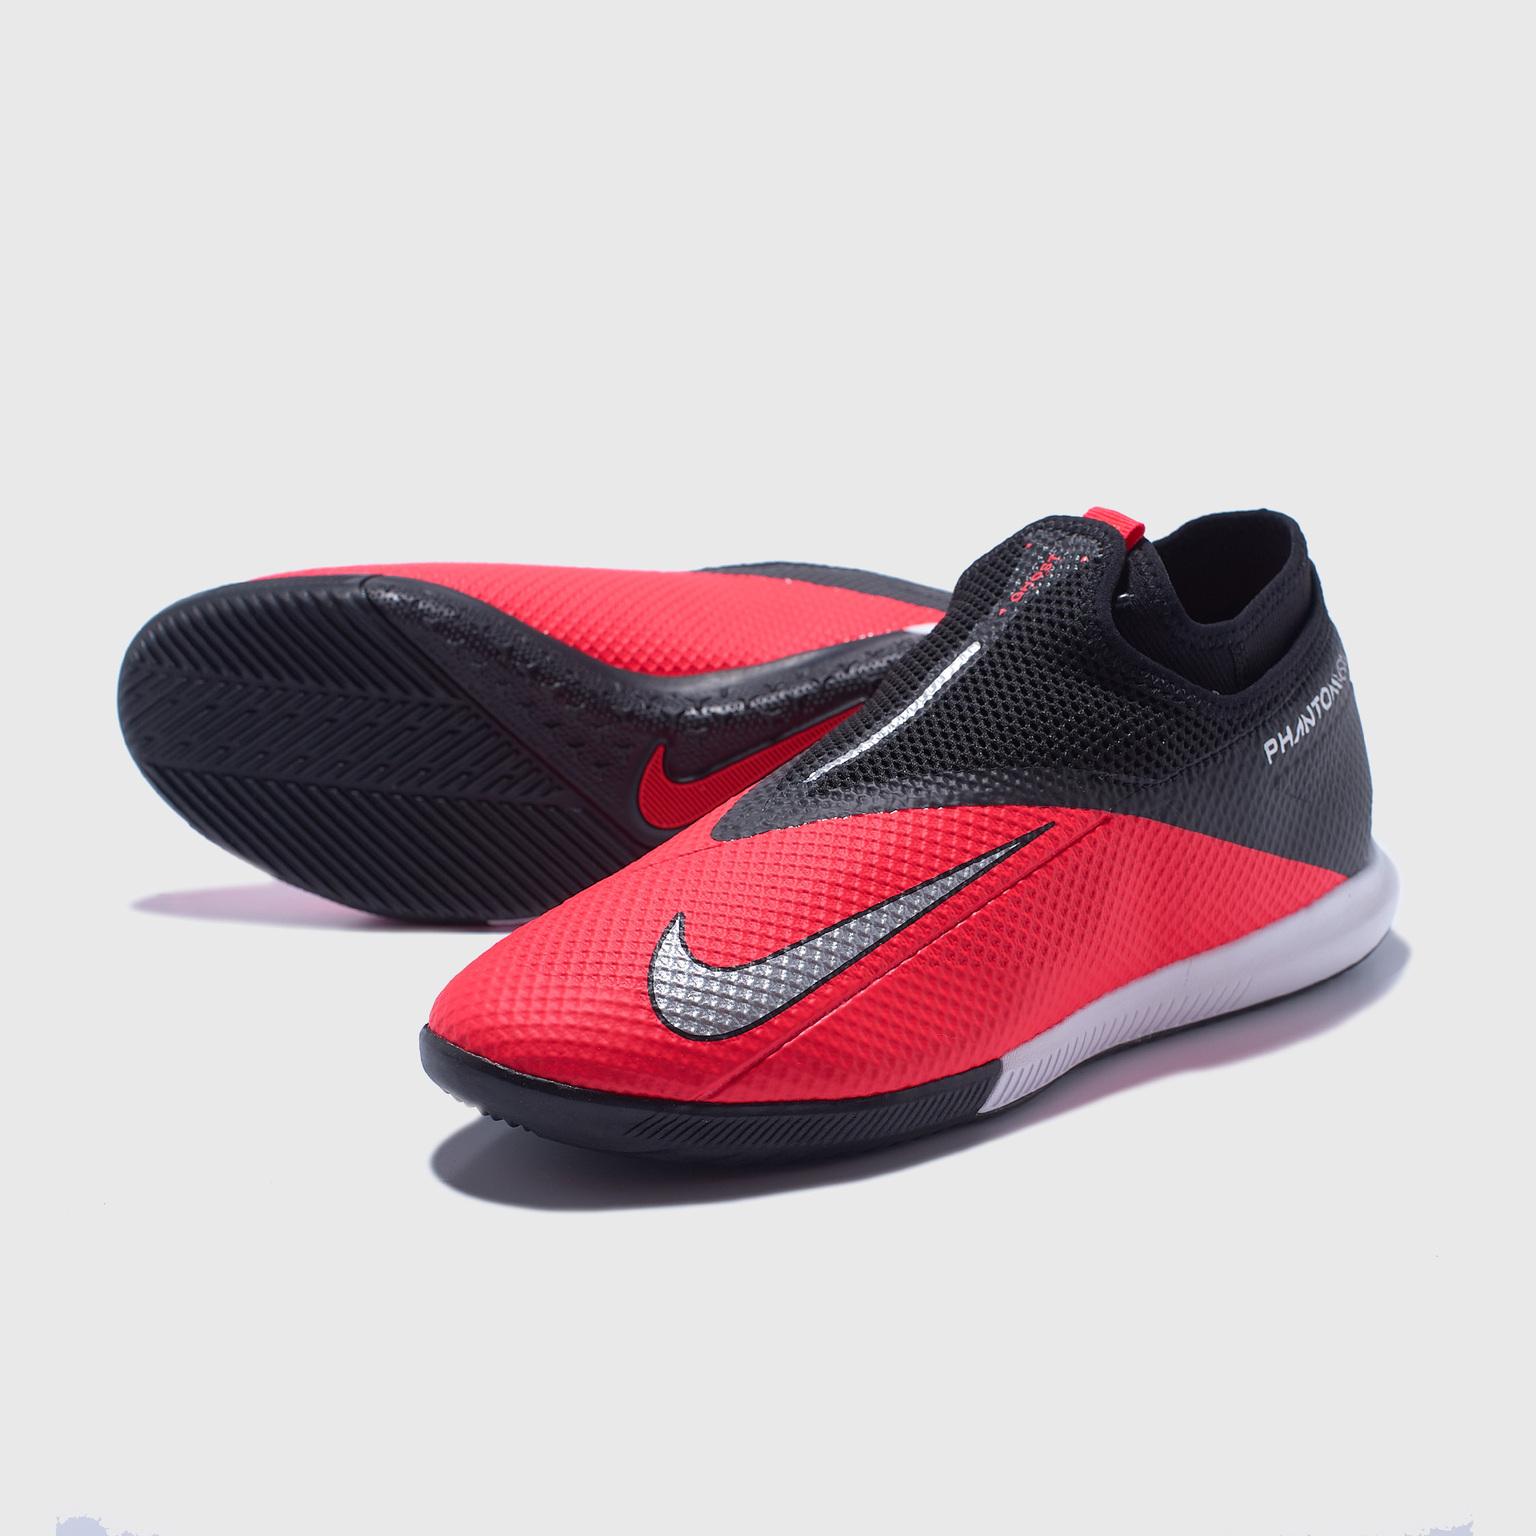 Футзалки Nike Phantom Vision 2 Academy DF IC CD4168-606 шиповки детские nike phantom vision 2 academy df tf cd4078 606